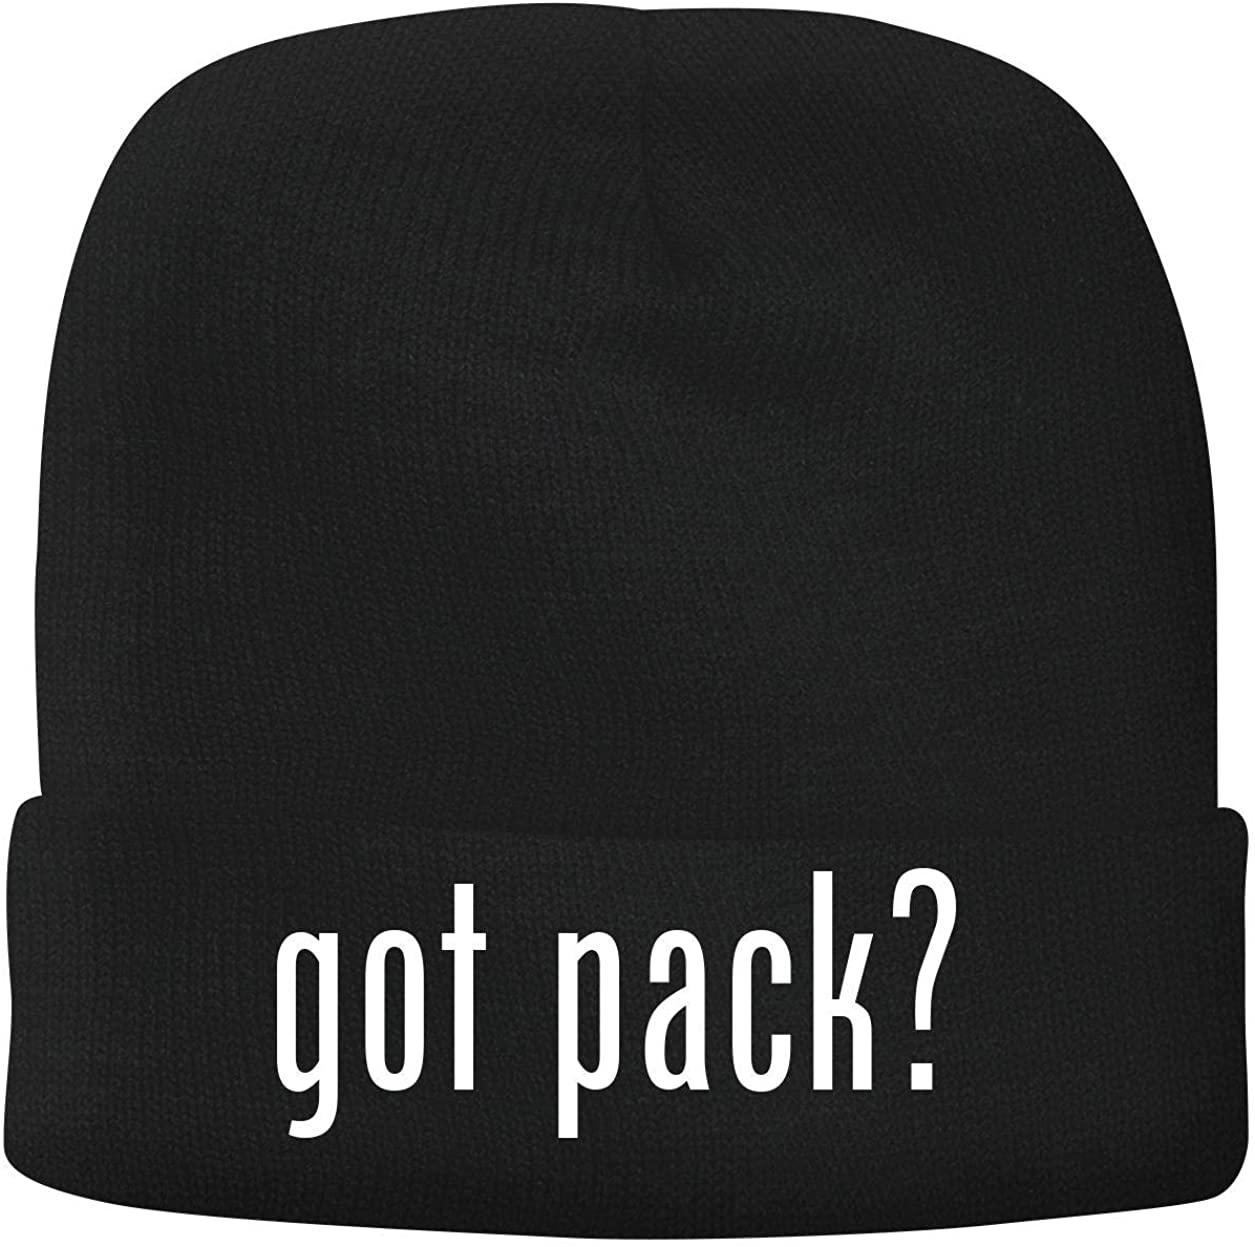 BH Cool Designs got Pack? - Men's Soft & Comfortable Beanie Hat Cap